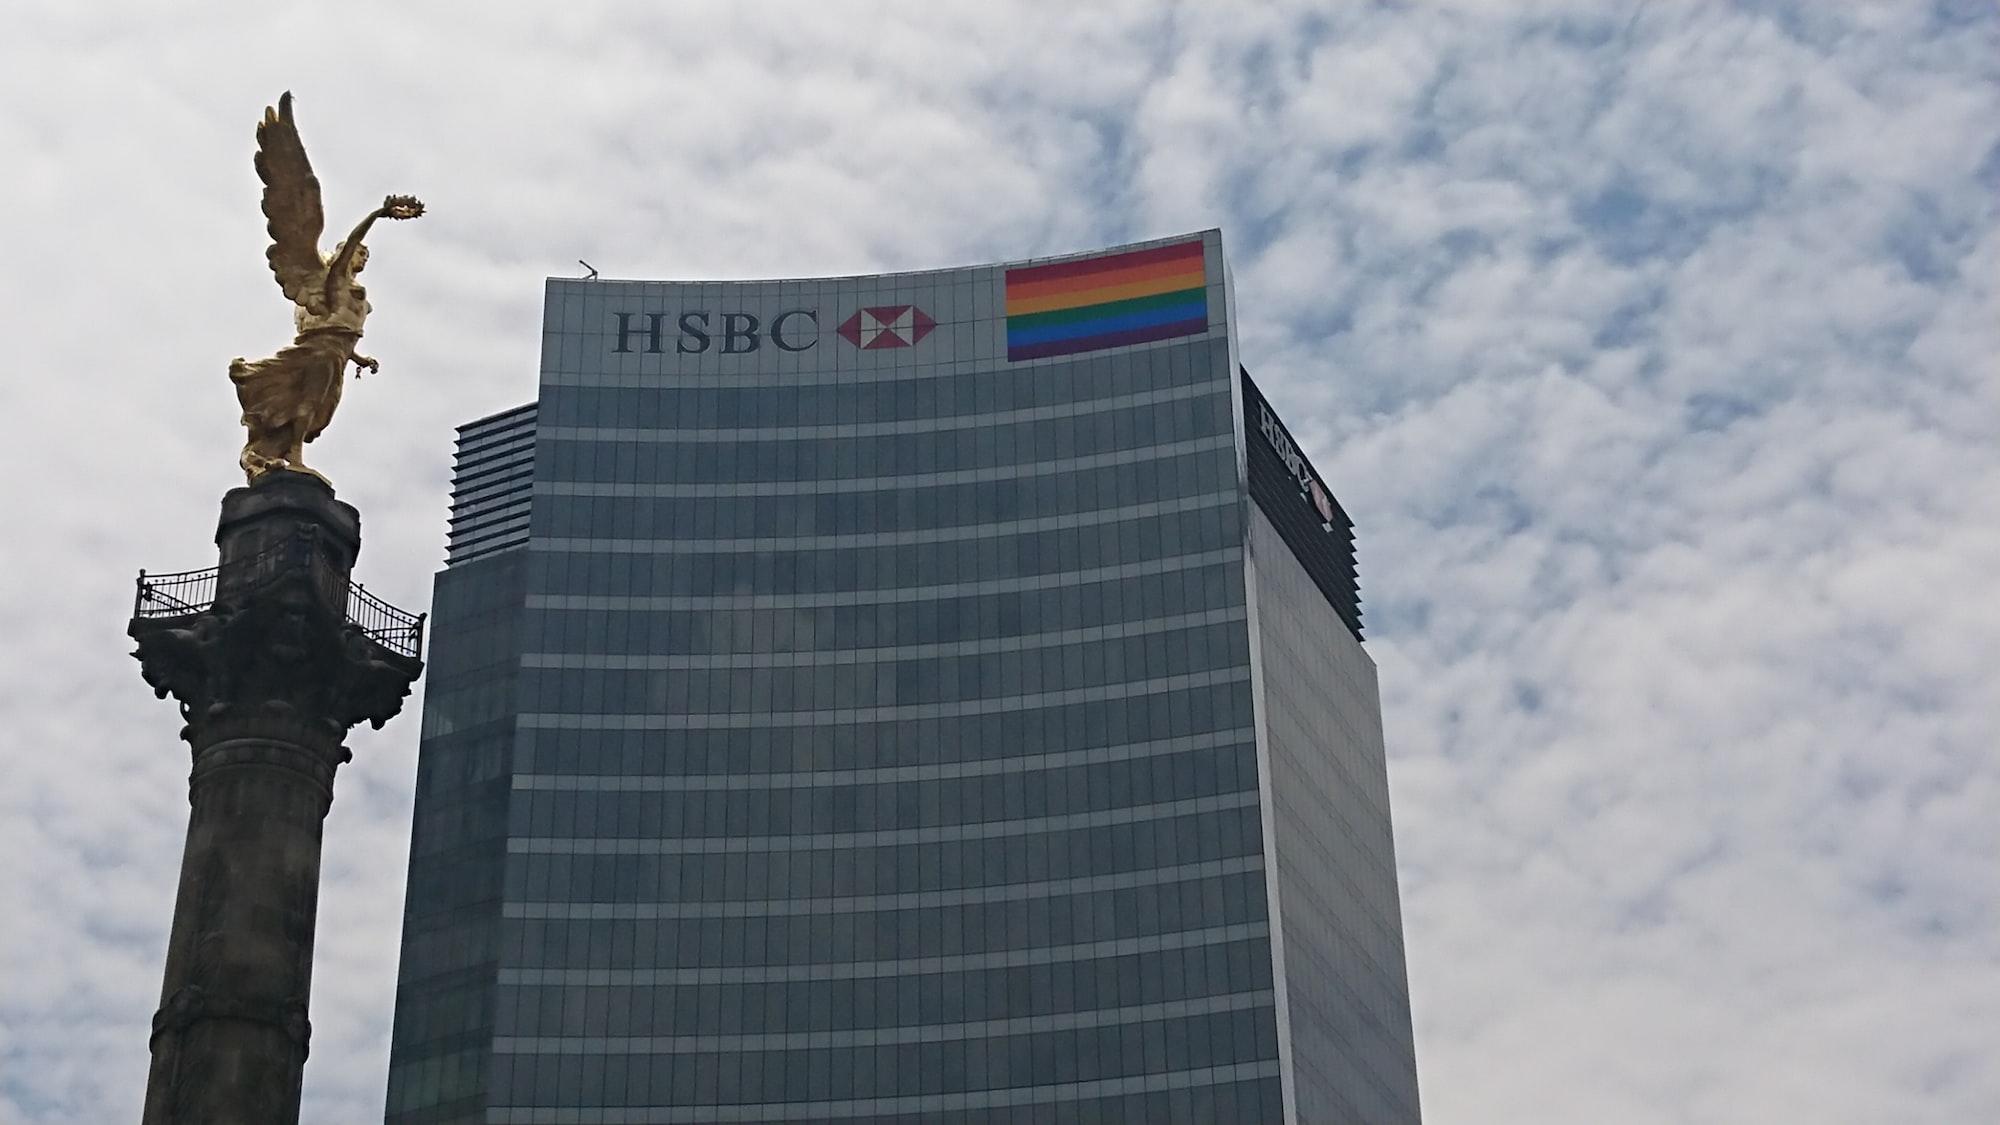 HSBC ขึ้นบัญชีดำหุ้น MicroStrategy เพราะพวกเขาลงทุนใน Bitcoin